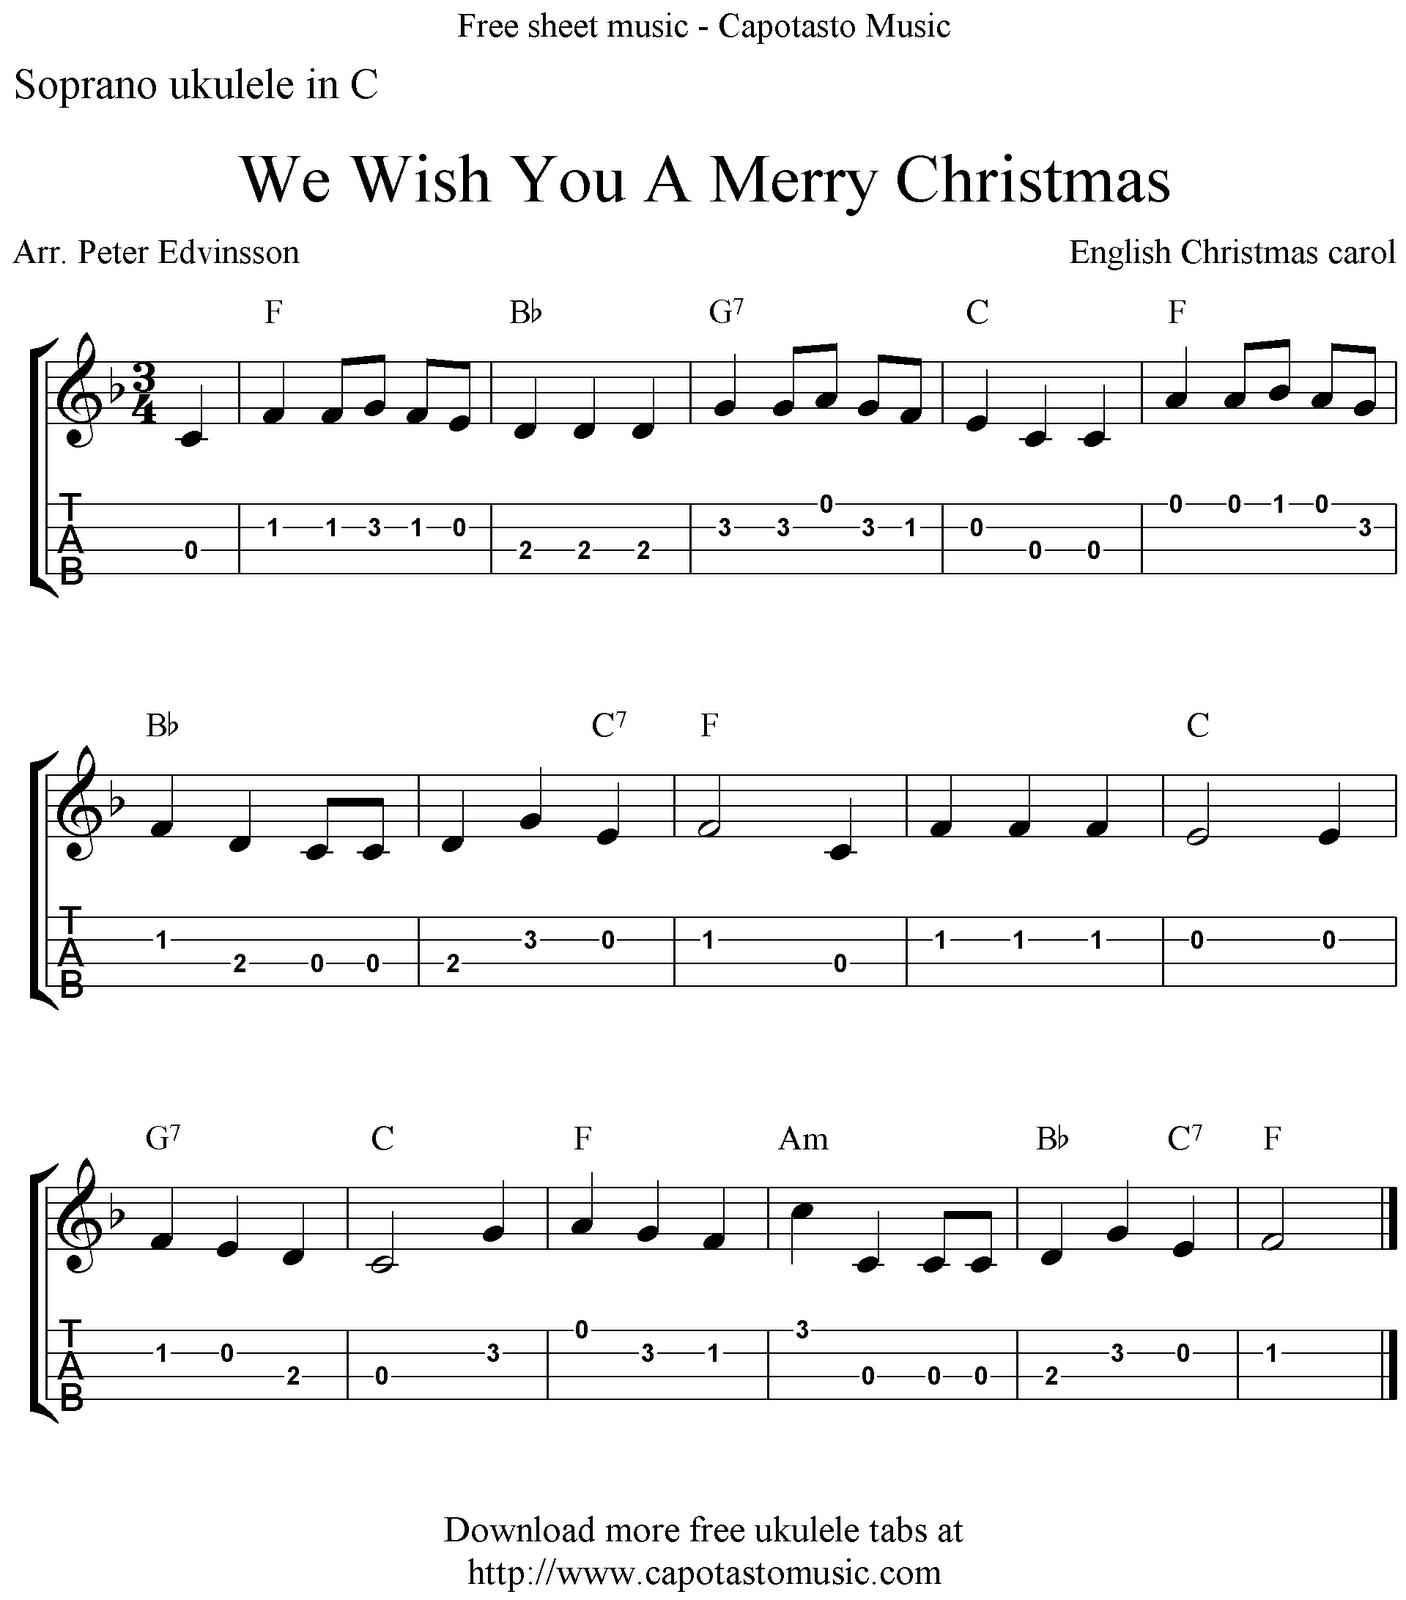 We Wish You A Merry Christmas, free Christmas ukulele tabs sheet music